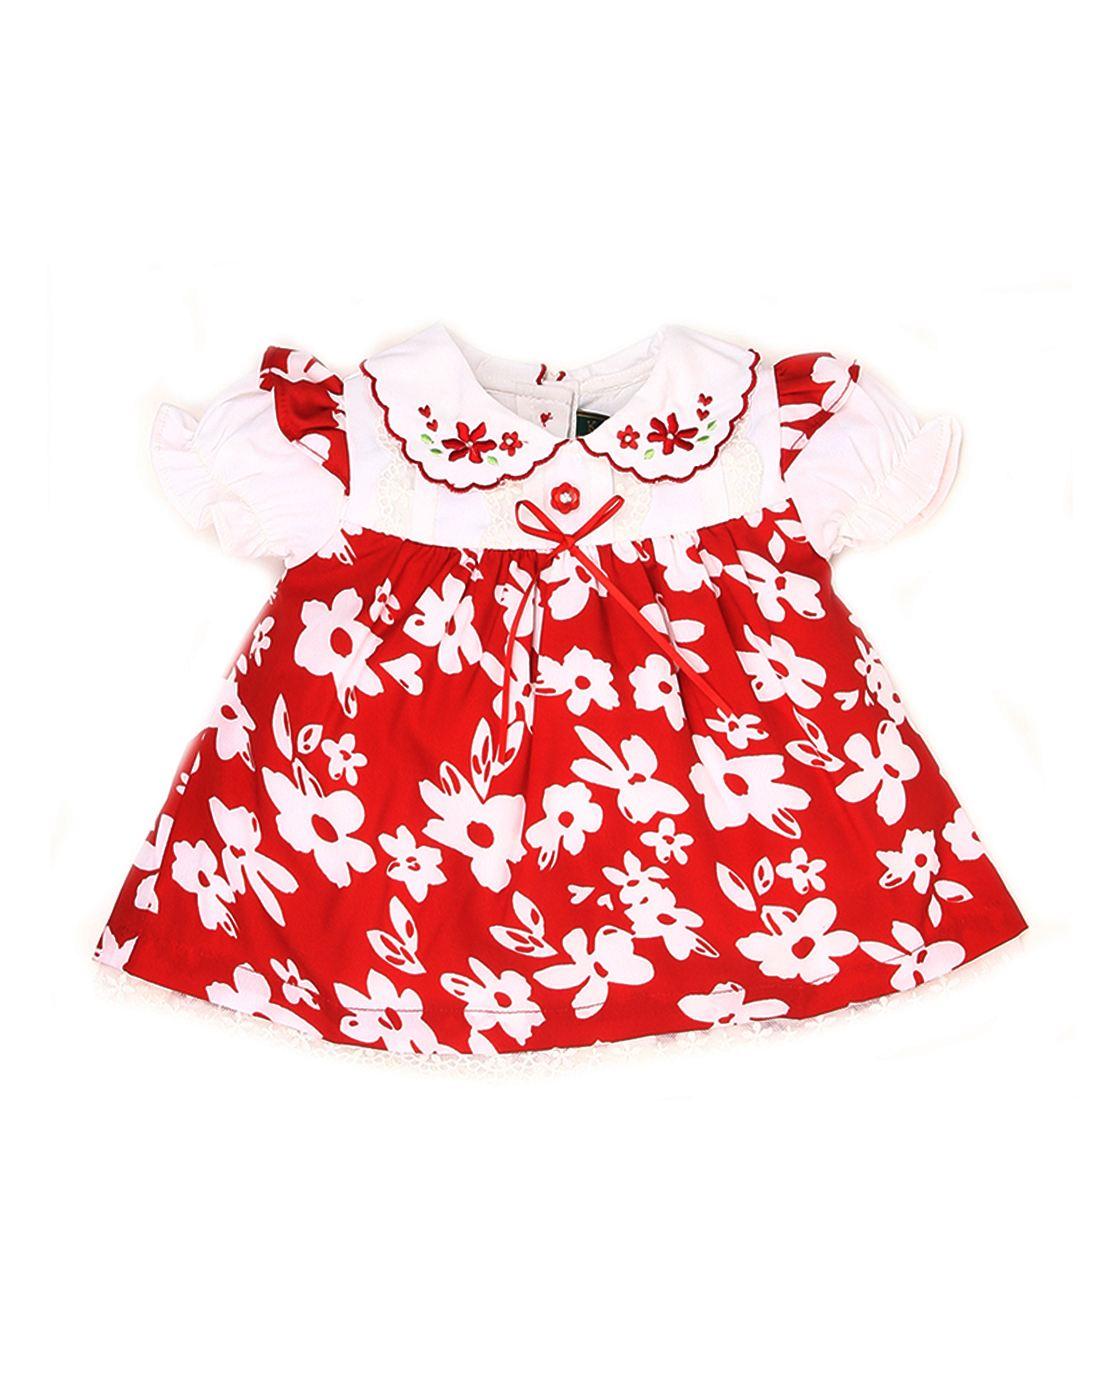 K.C.O 89 Baby Girls Casual Floral Print Half Sleeve Dress